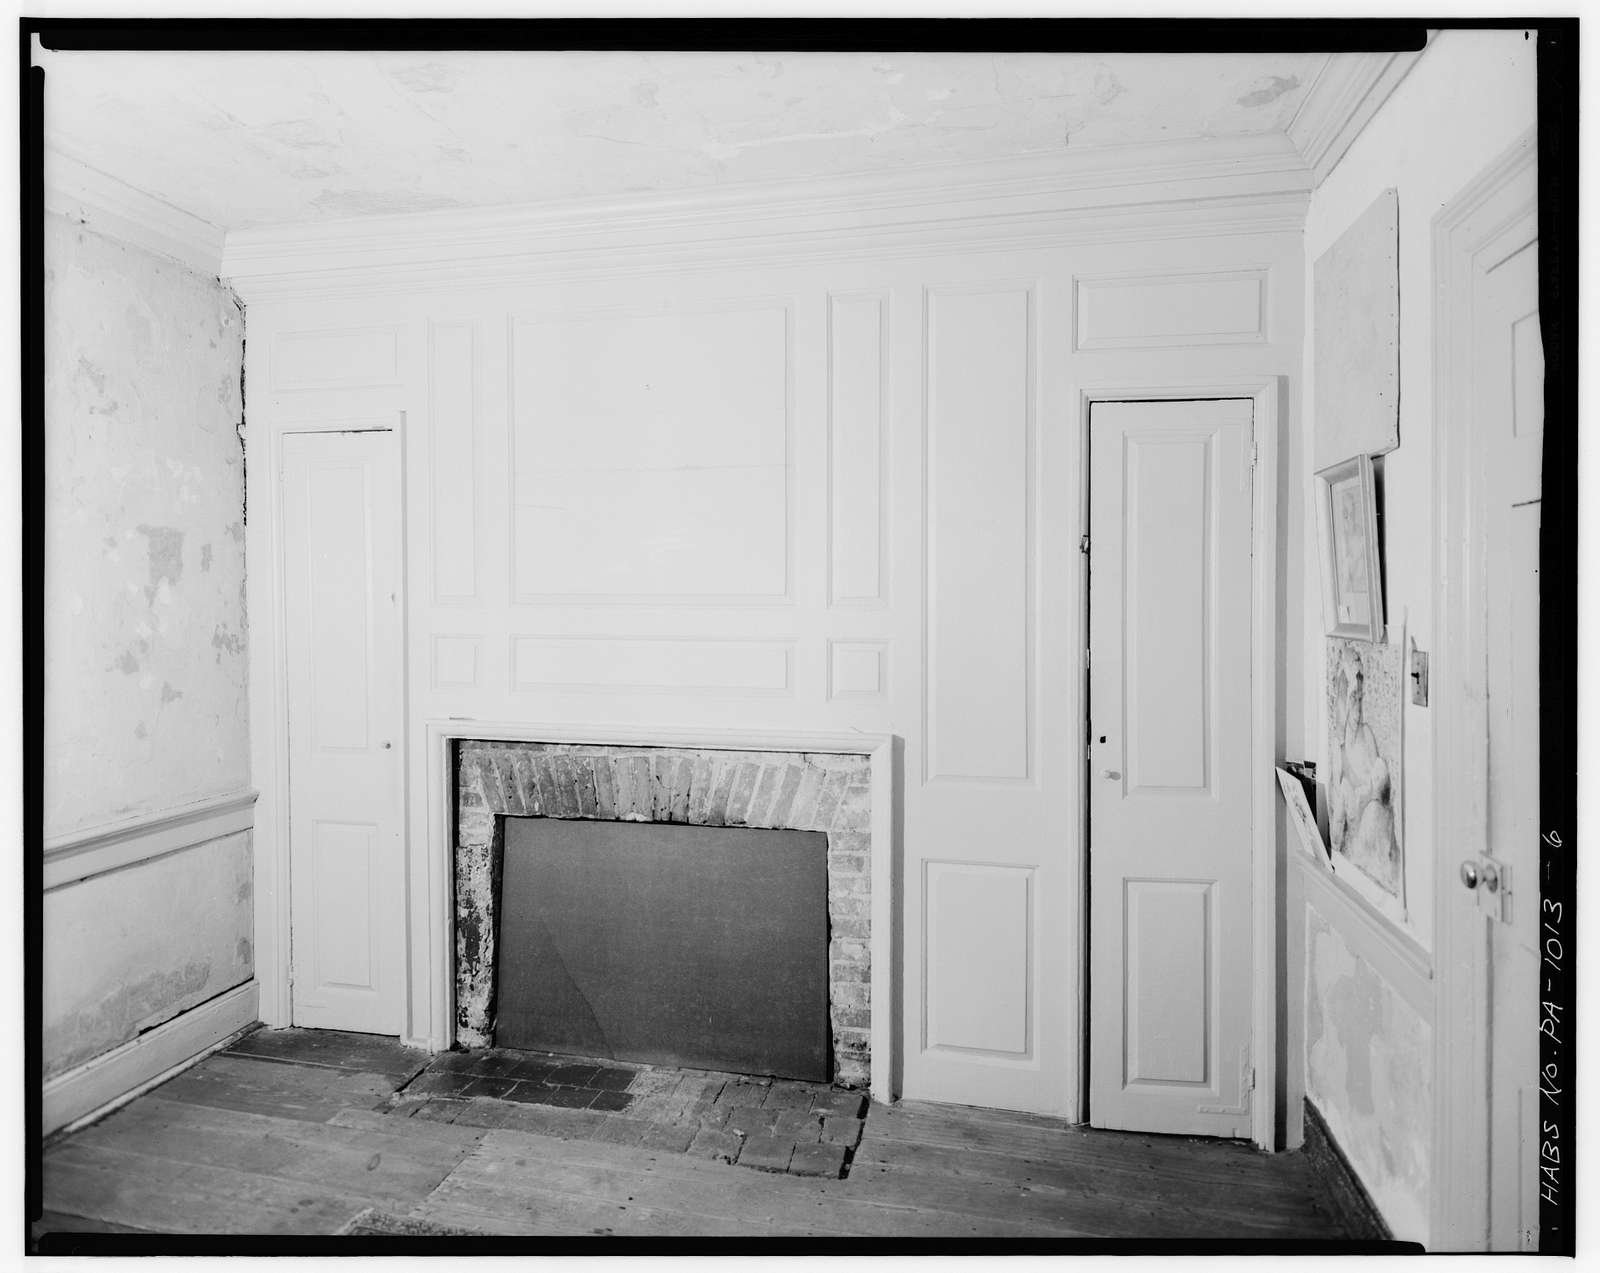 Nathaniel Irish House, 704 South Front Street, Philadelphia, Philadelphia County, PA